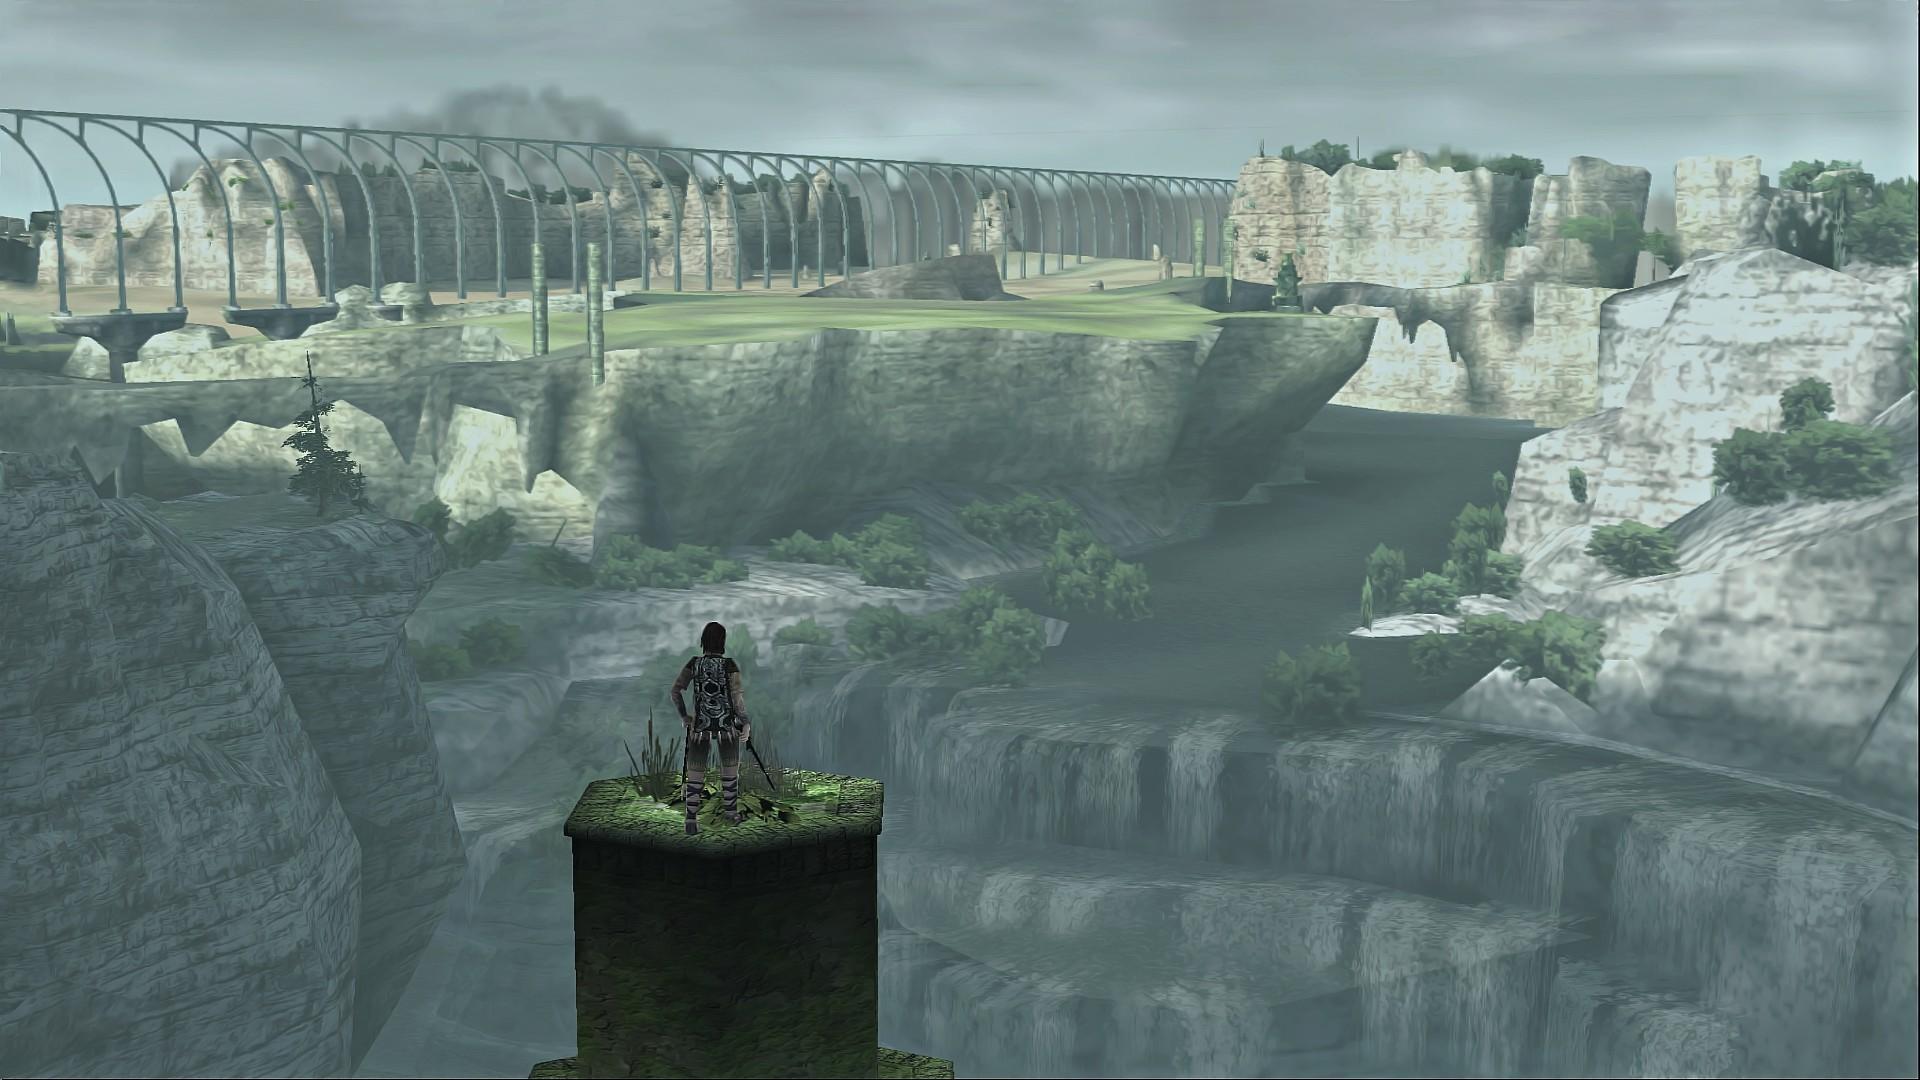 Shadow-of-the-Colossus-SOTC-Wallpaper-Avion-Delta-